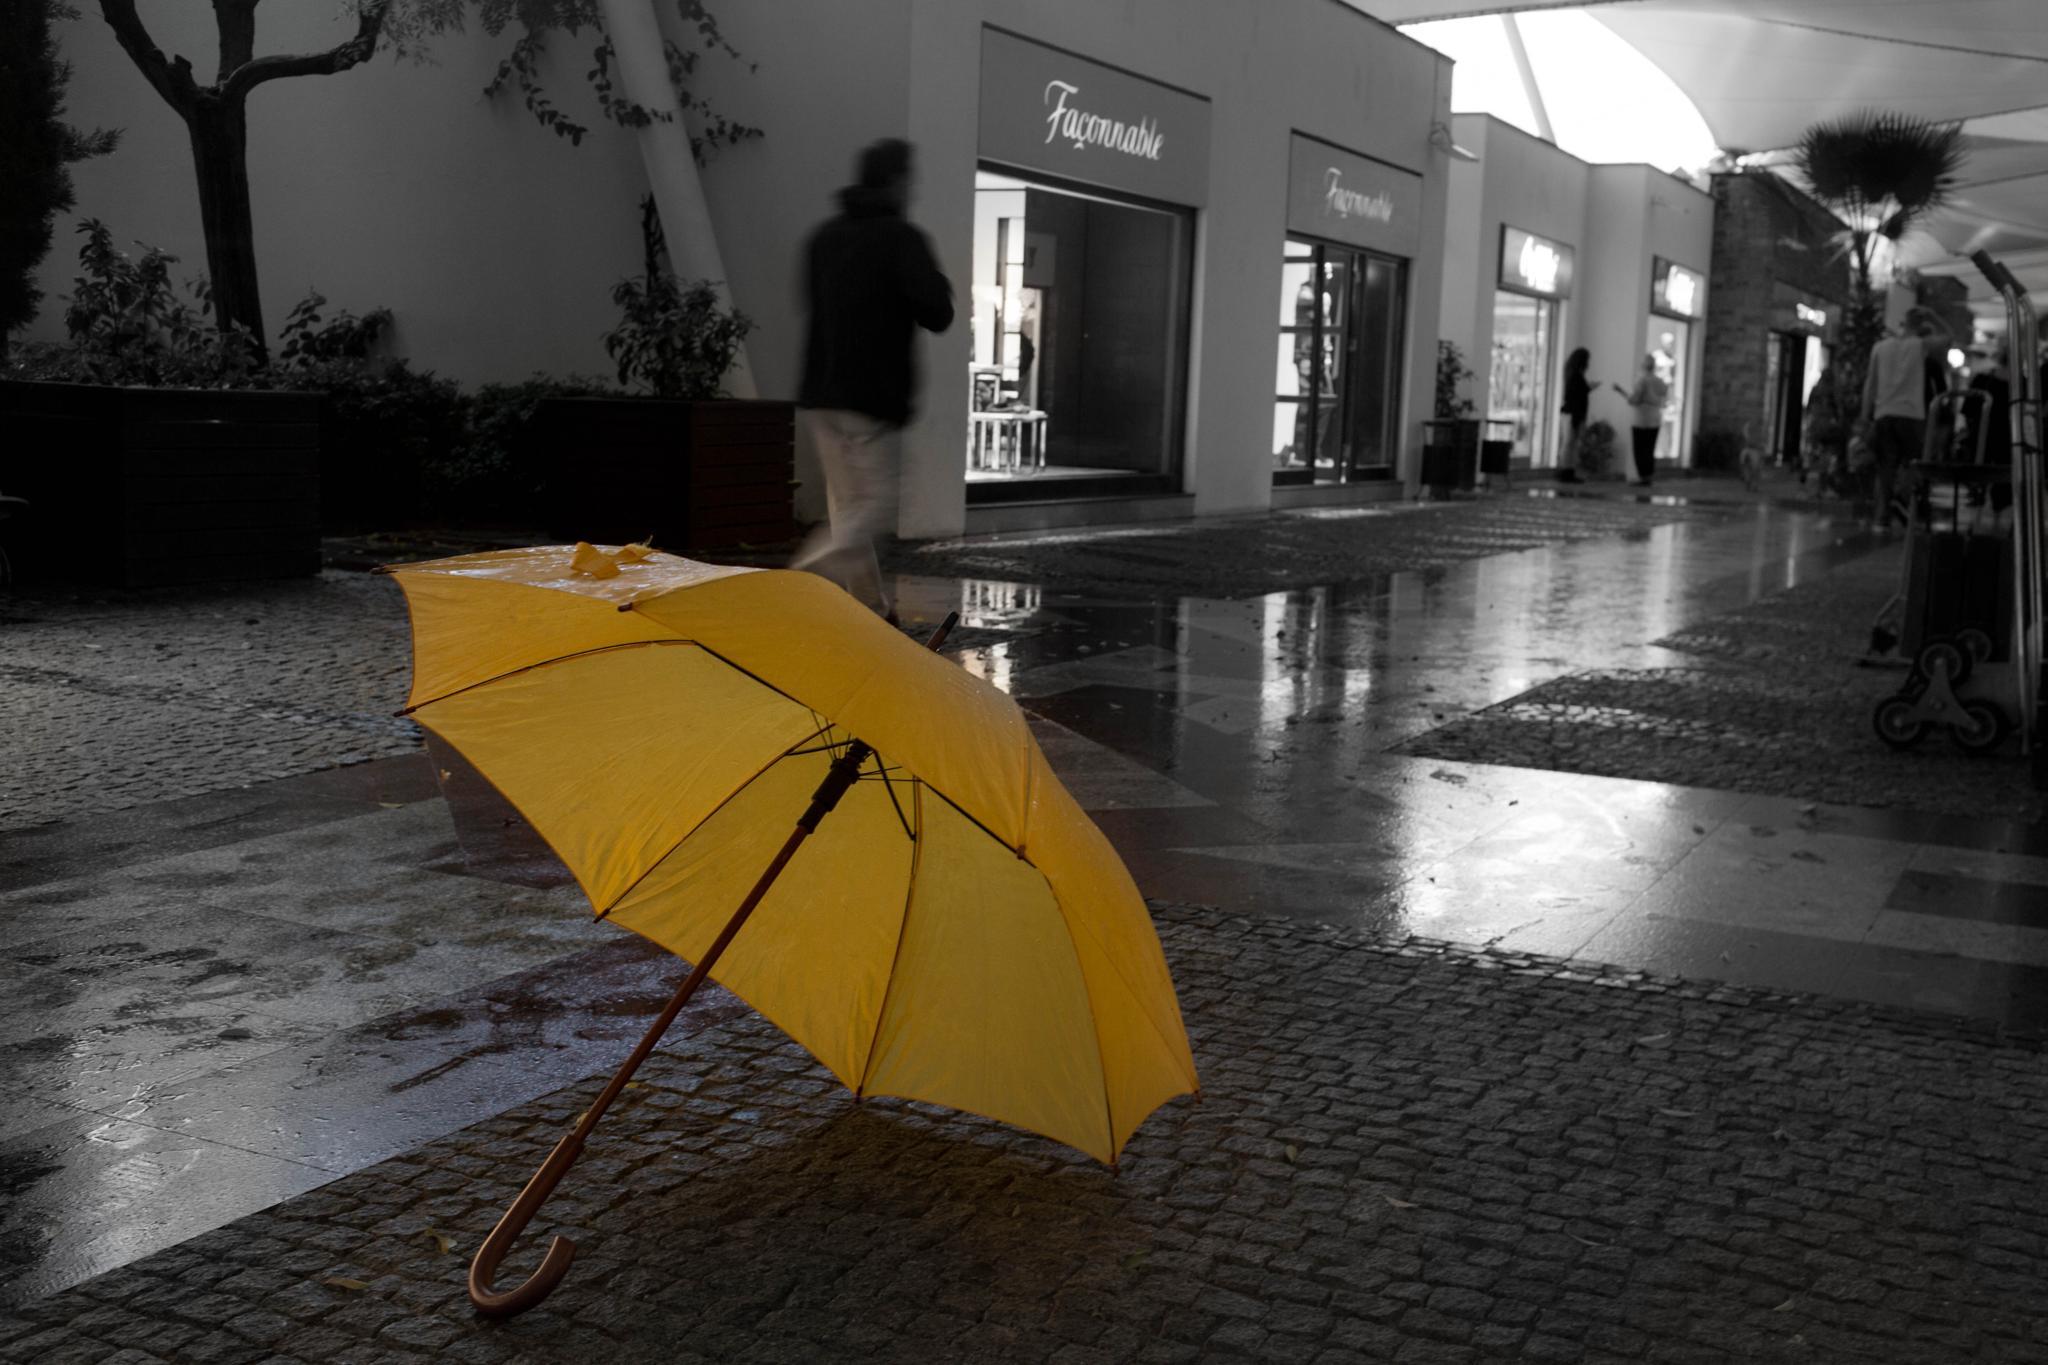 the Yellow Umbrella by Can Berkol